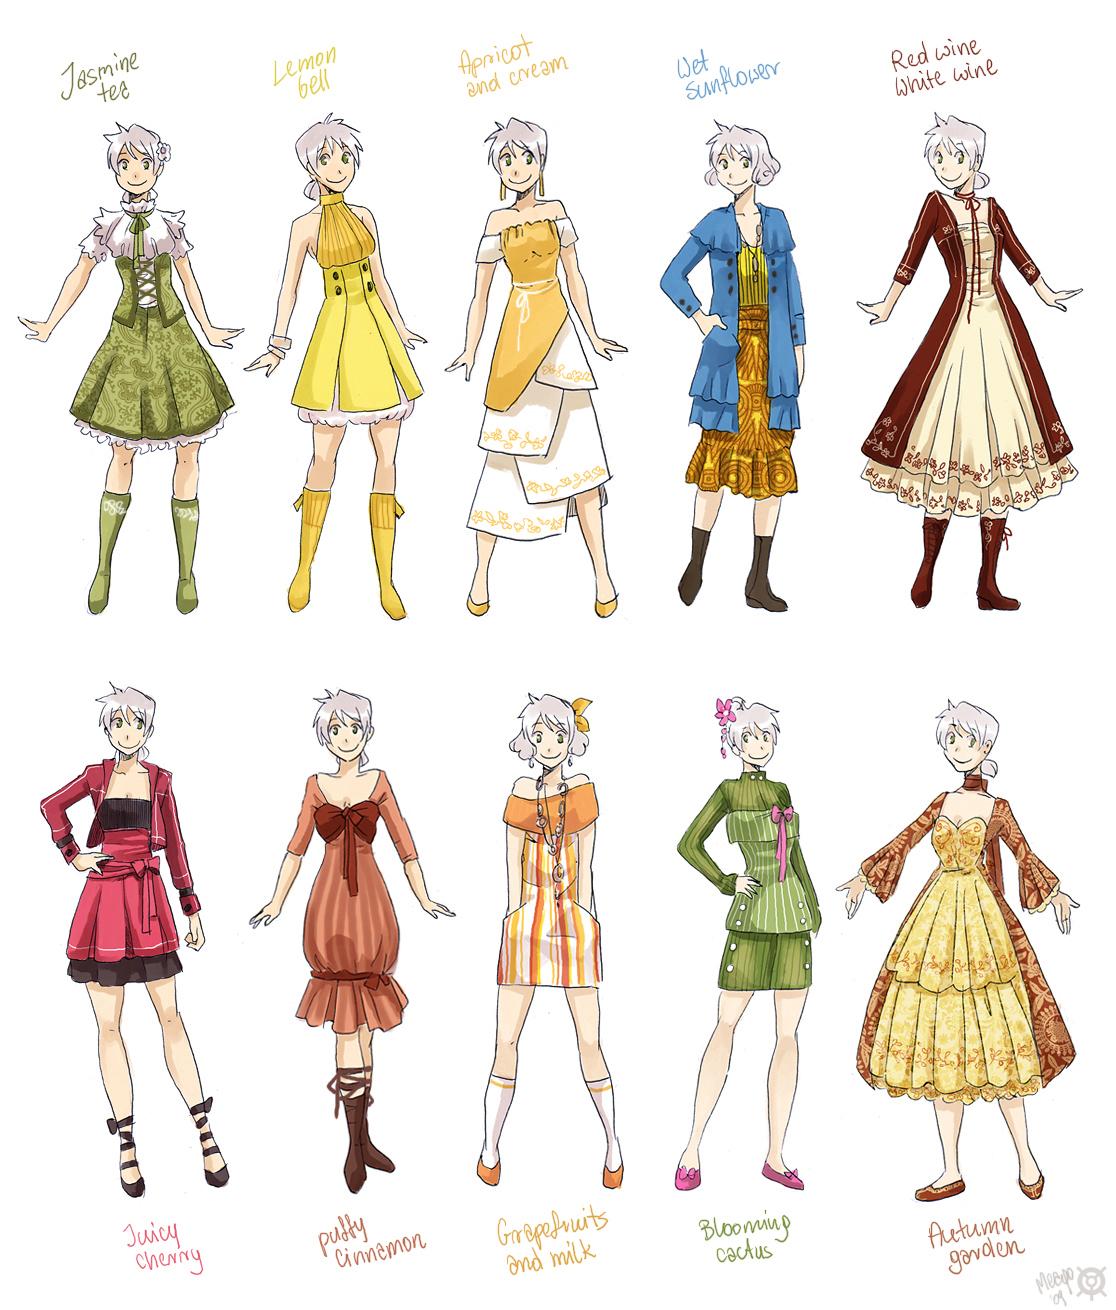 Female clothes 2 by meago designs interfaces fashion fashion design